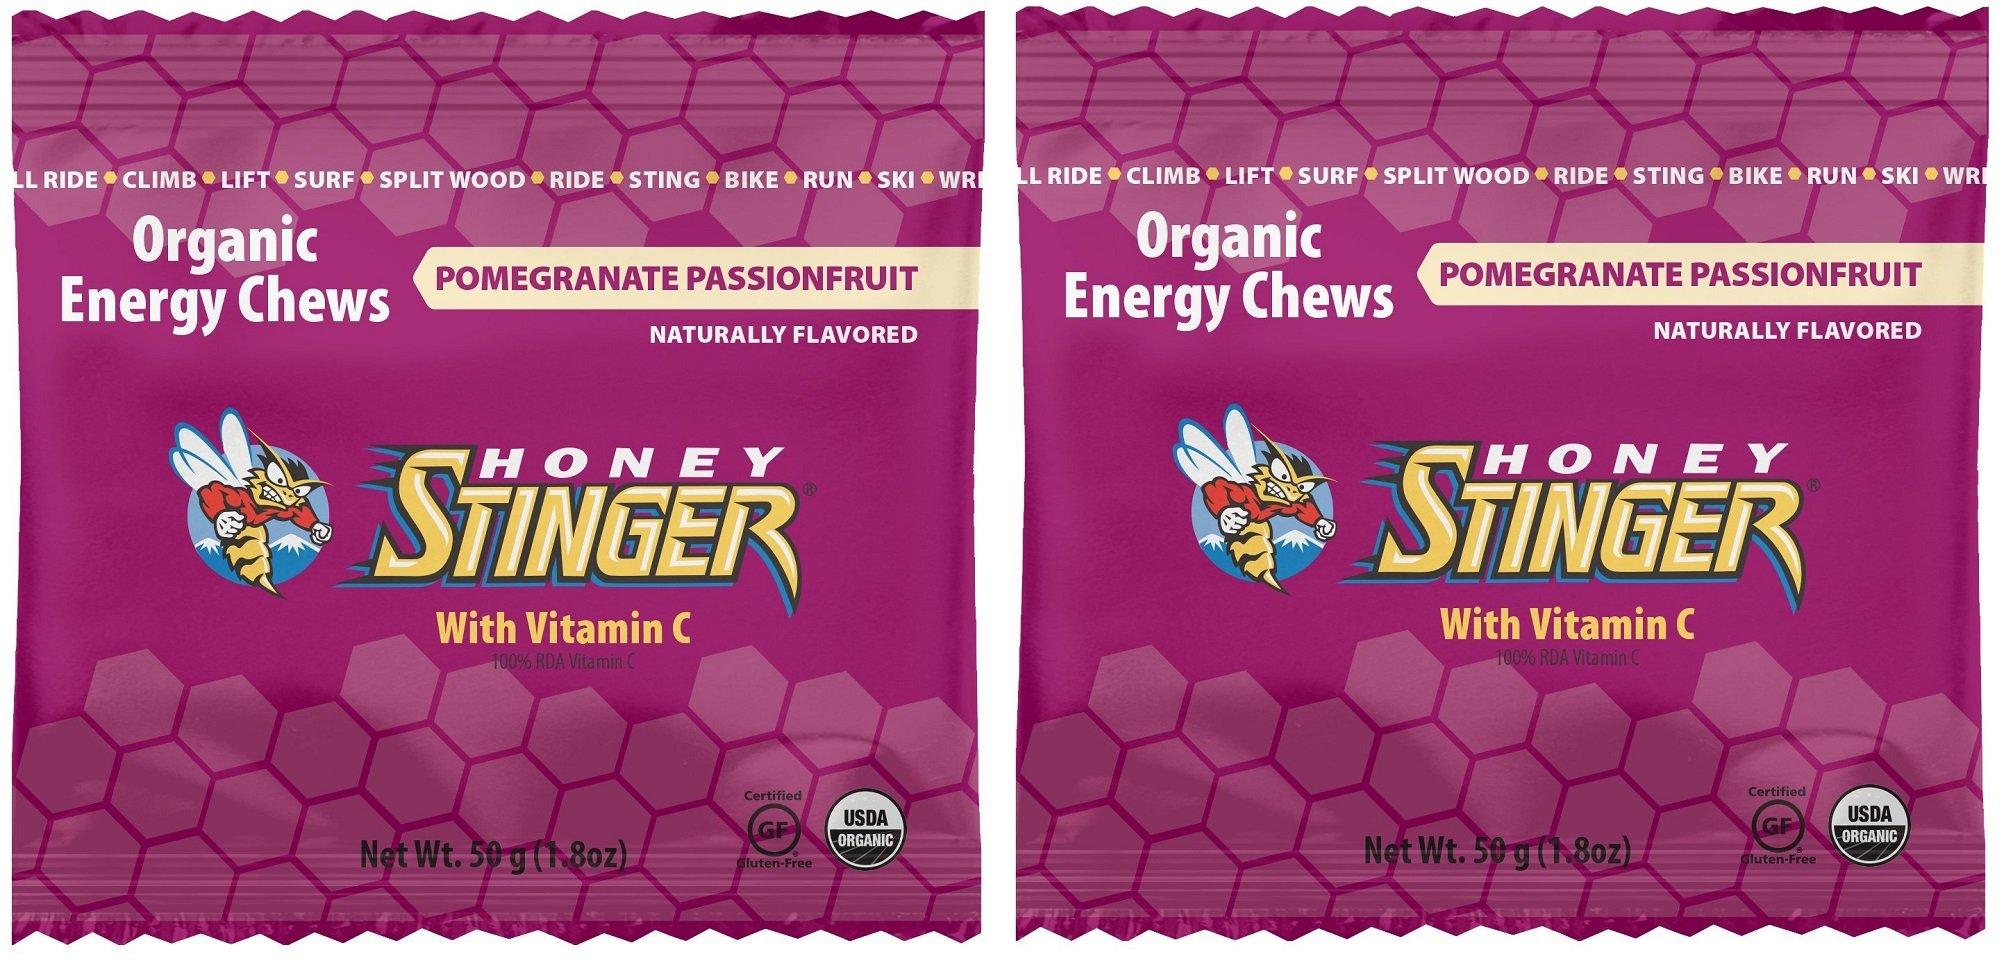 Honey Stinger Organic Energy Chews wddPBF, 2Pack (Pomegranate Passion Fruit)